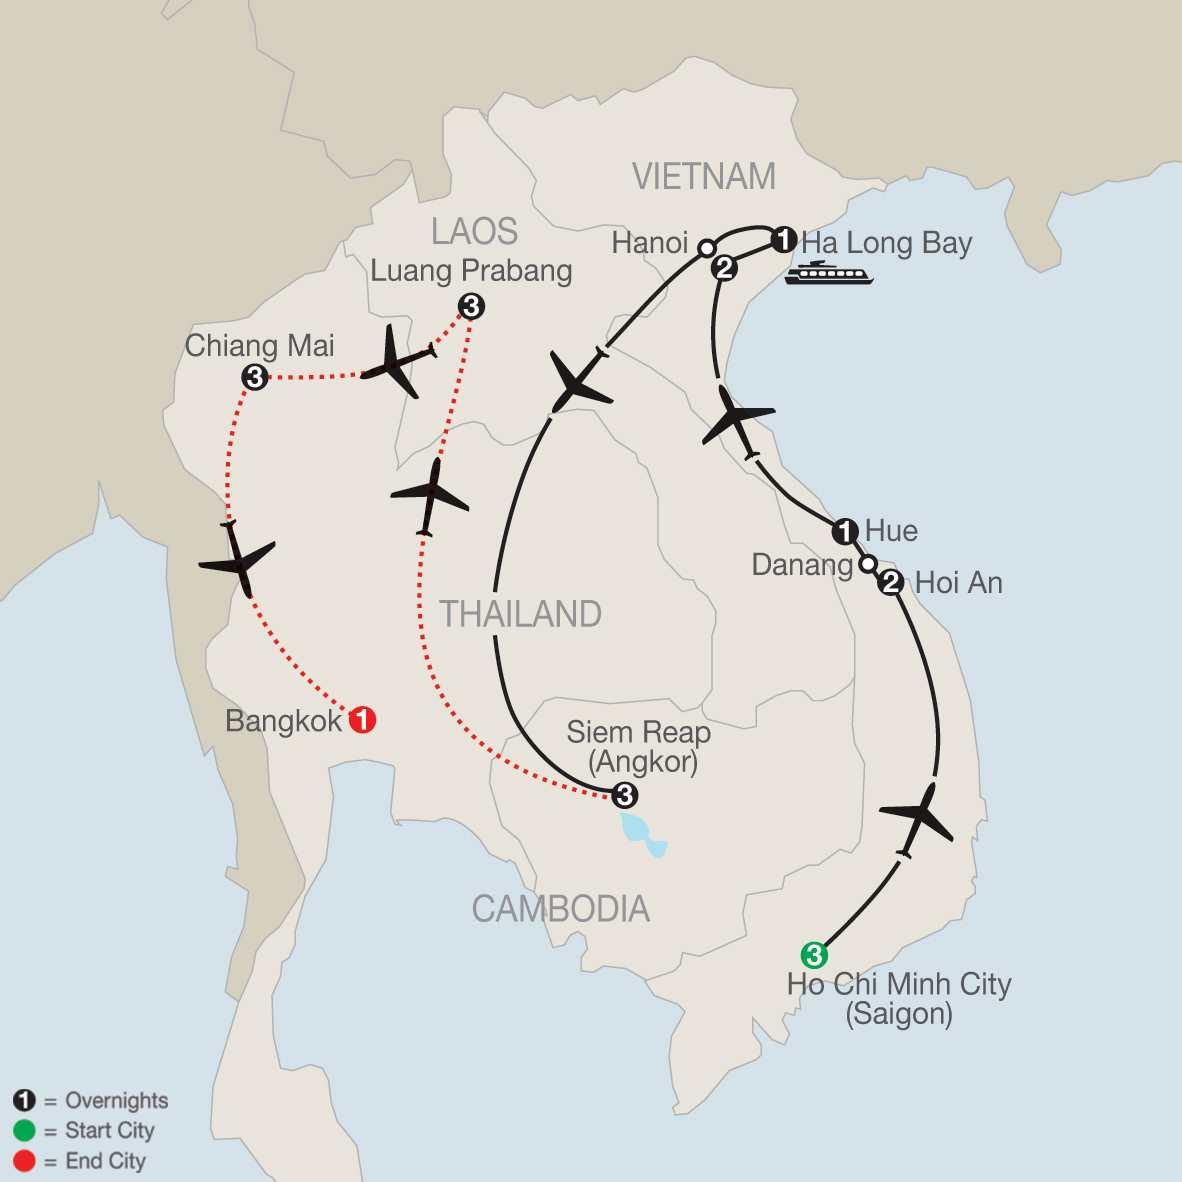 Exploring Vietnam & Cambodia with Luang Prabang & Chiang Mai